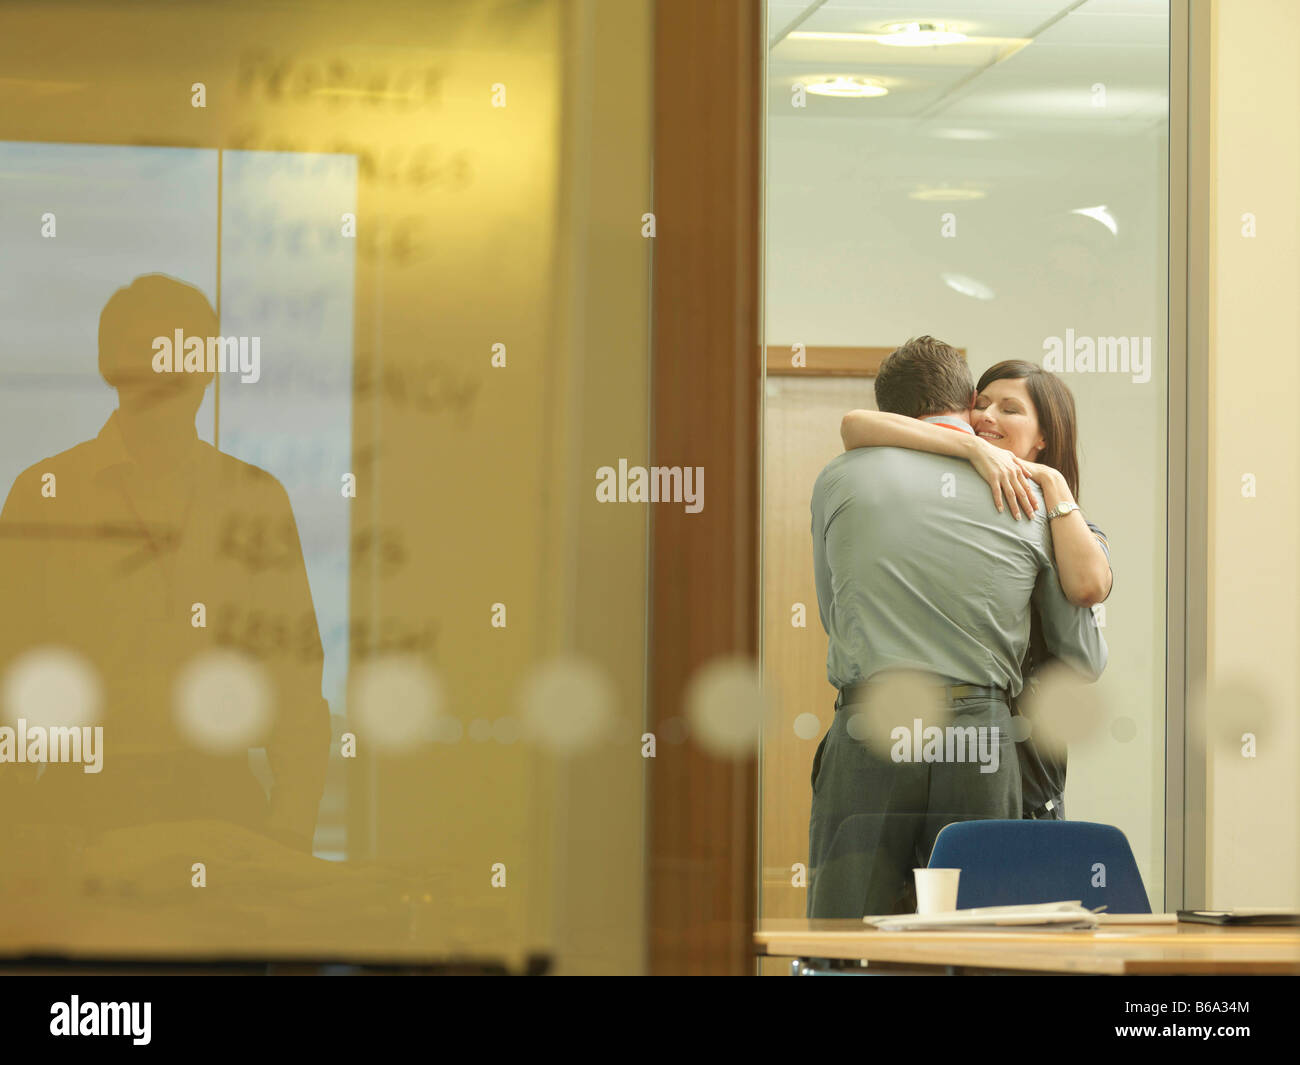 Office couple cuddling - Stock Image